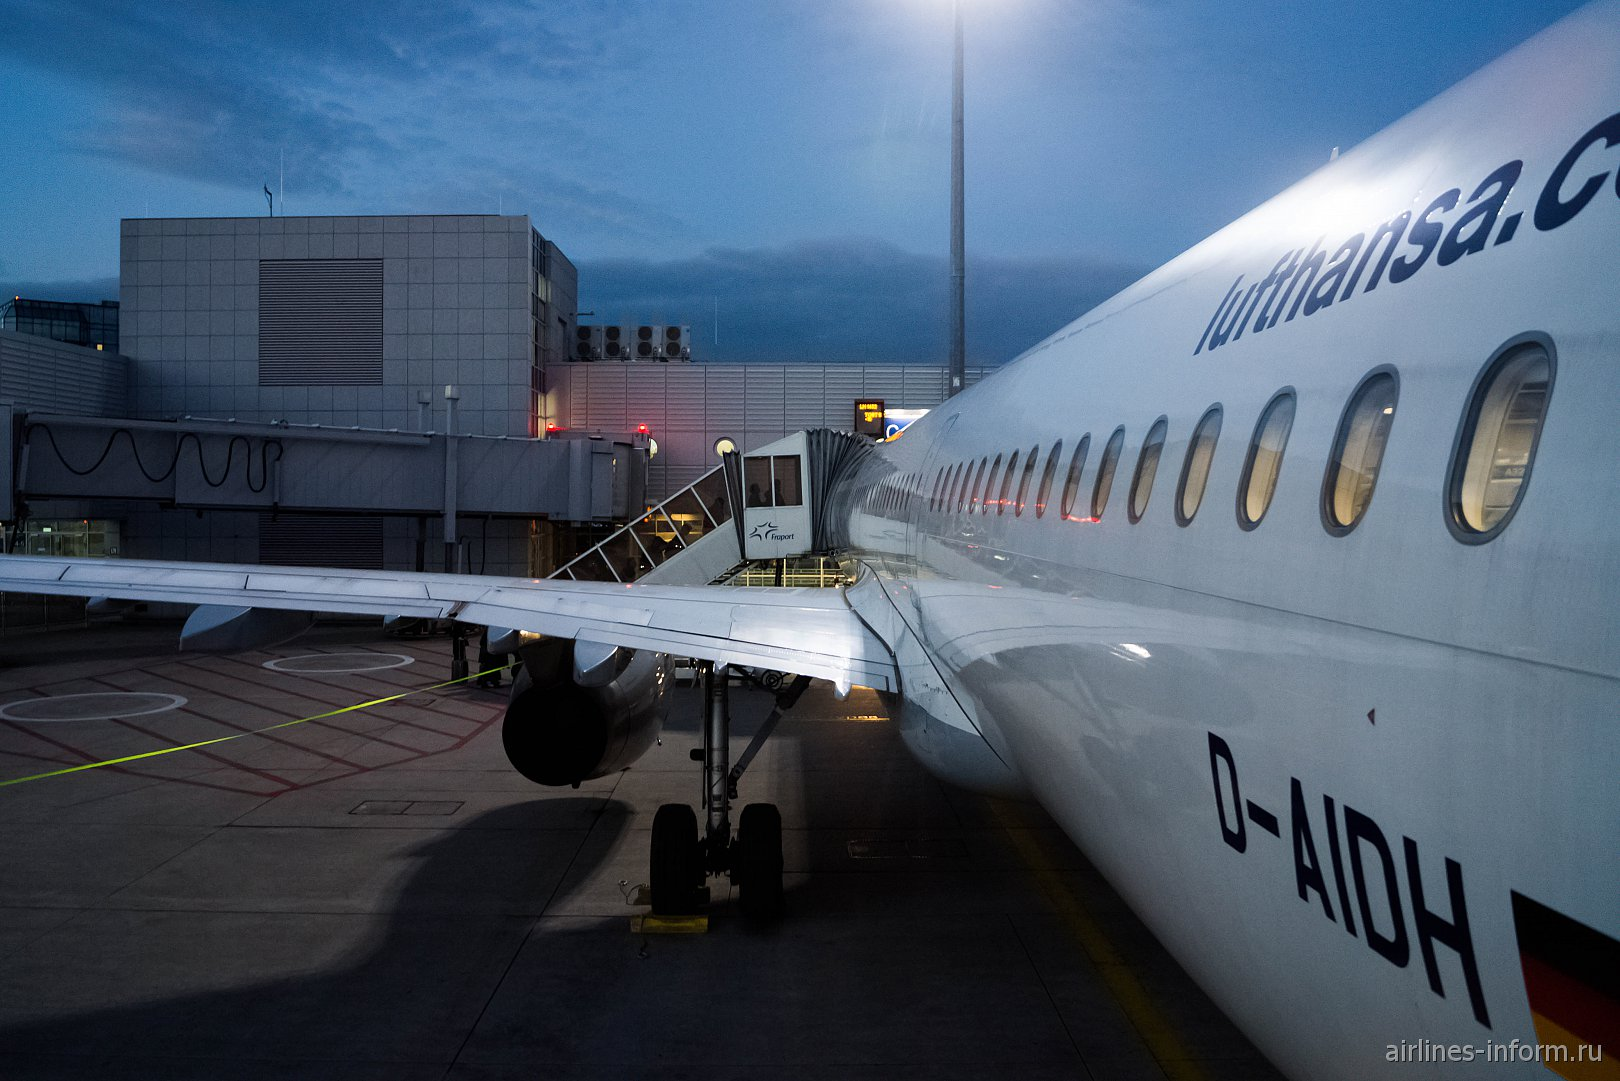 Frankfurt - Moscow LH1452 Lufthansa